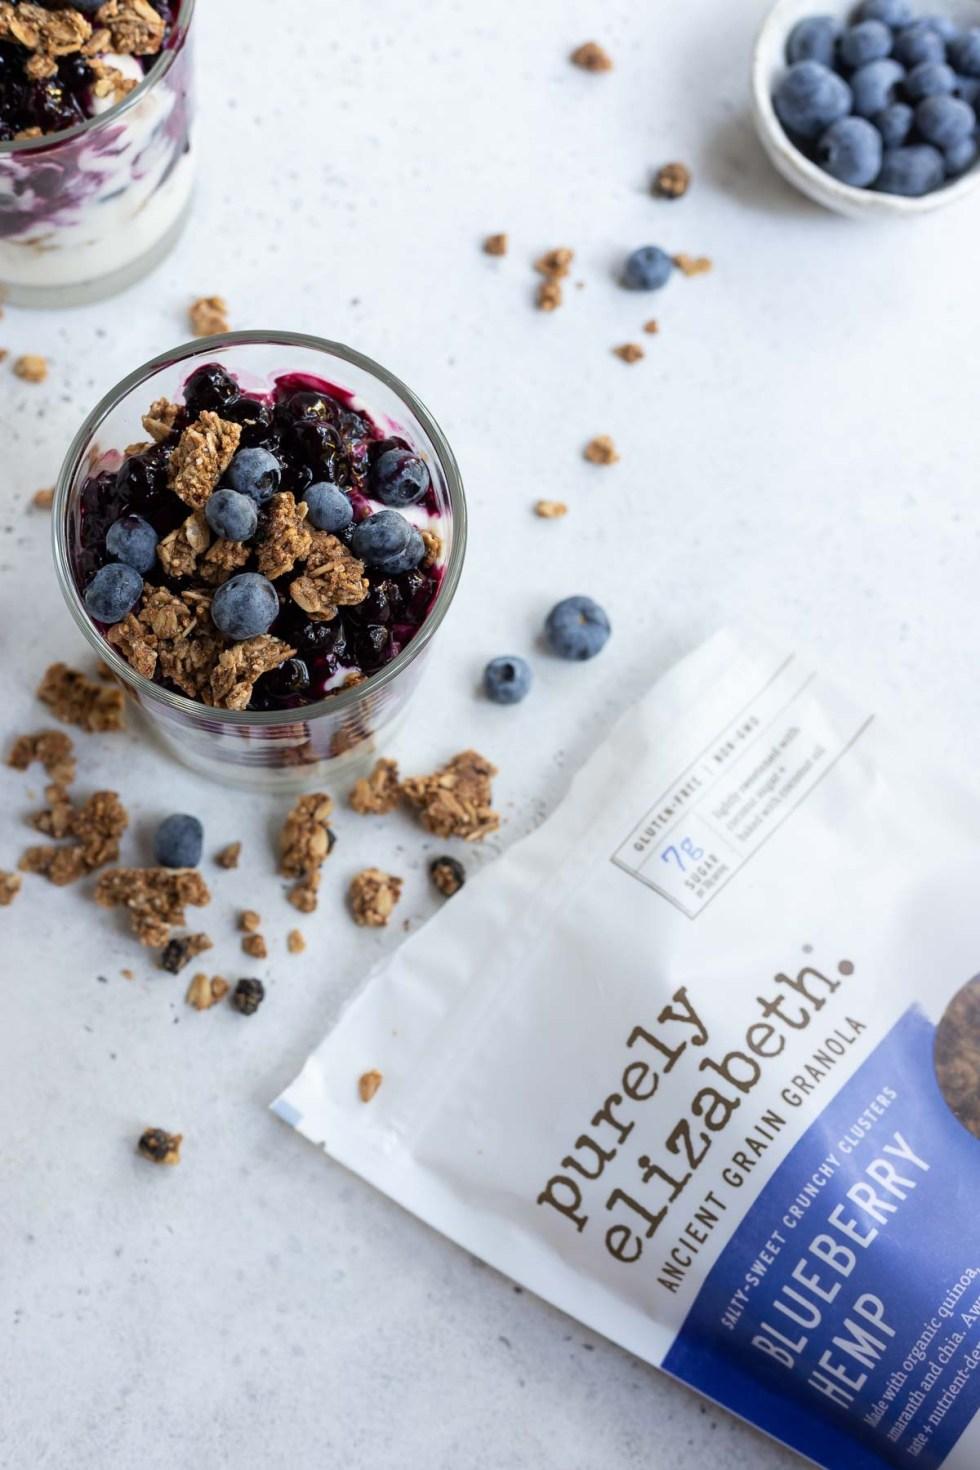 granola blueberry yogurt parfait next to bag of granola